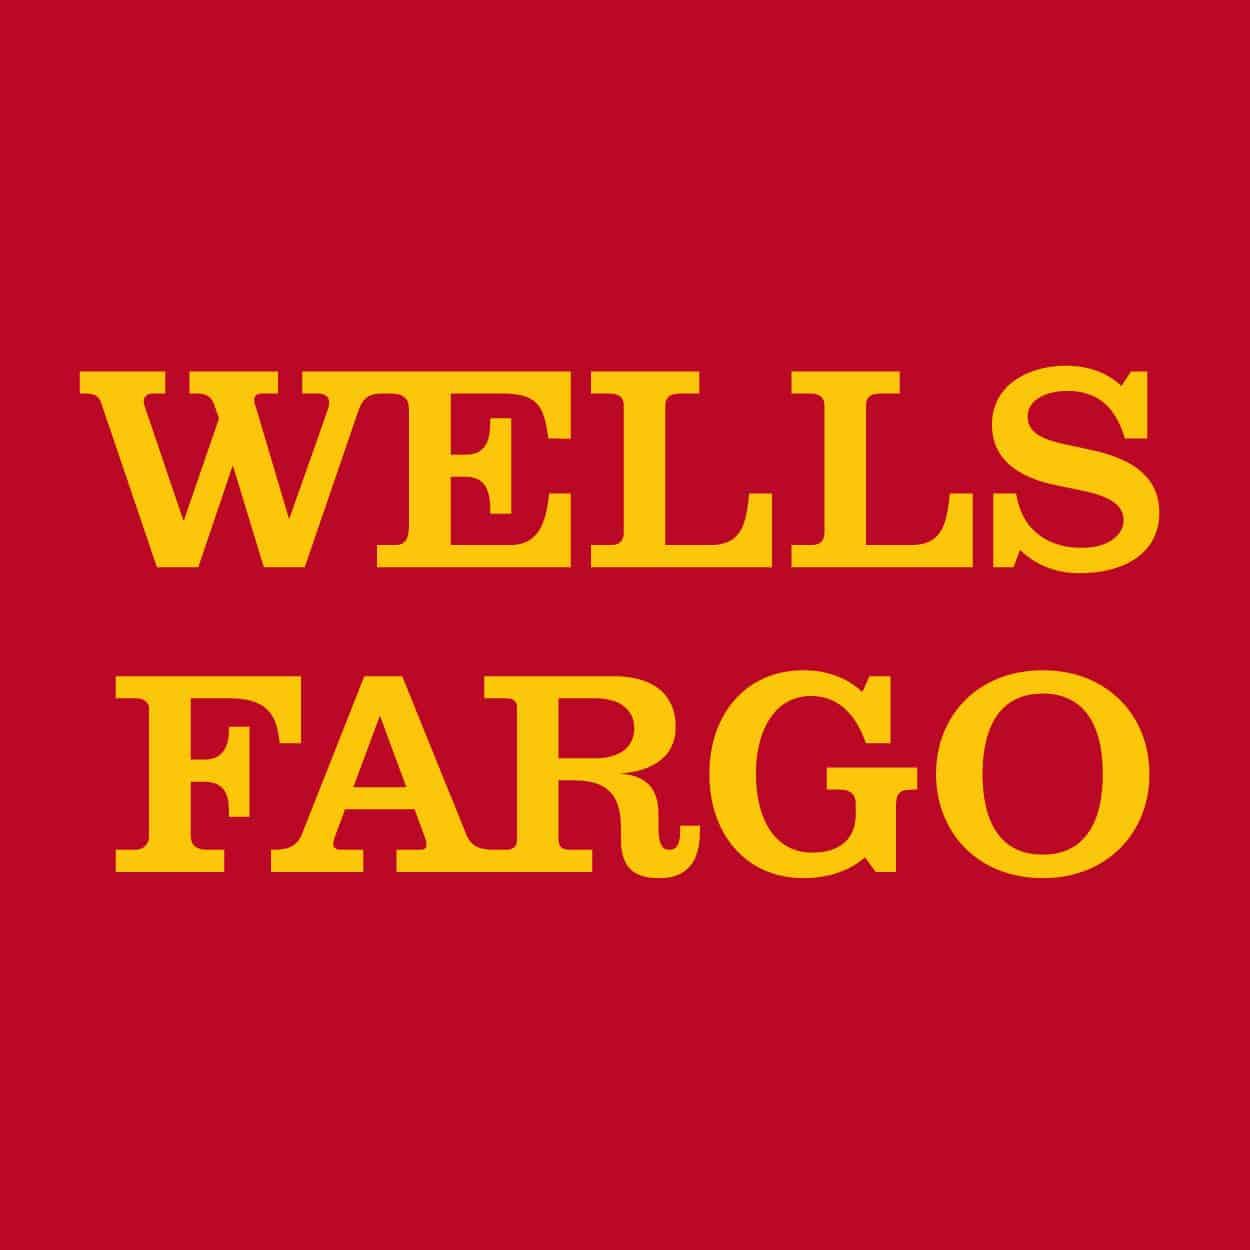 Wells Fargo ColaJazz